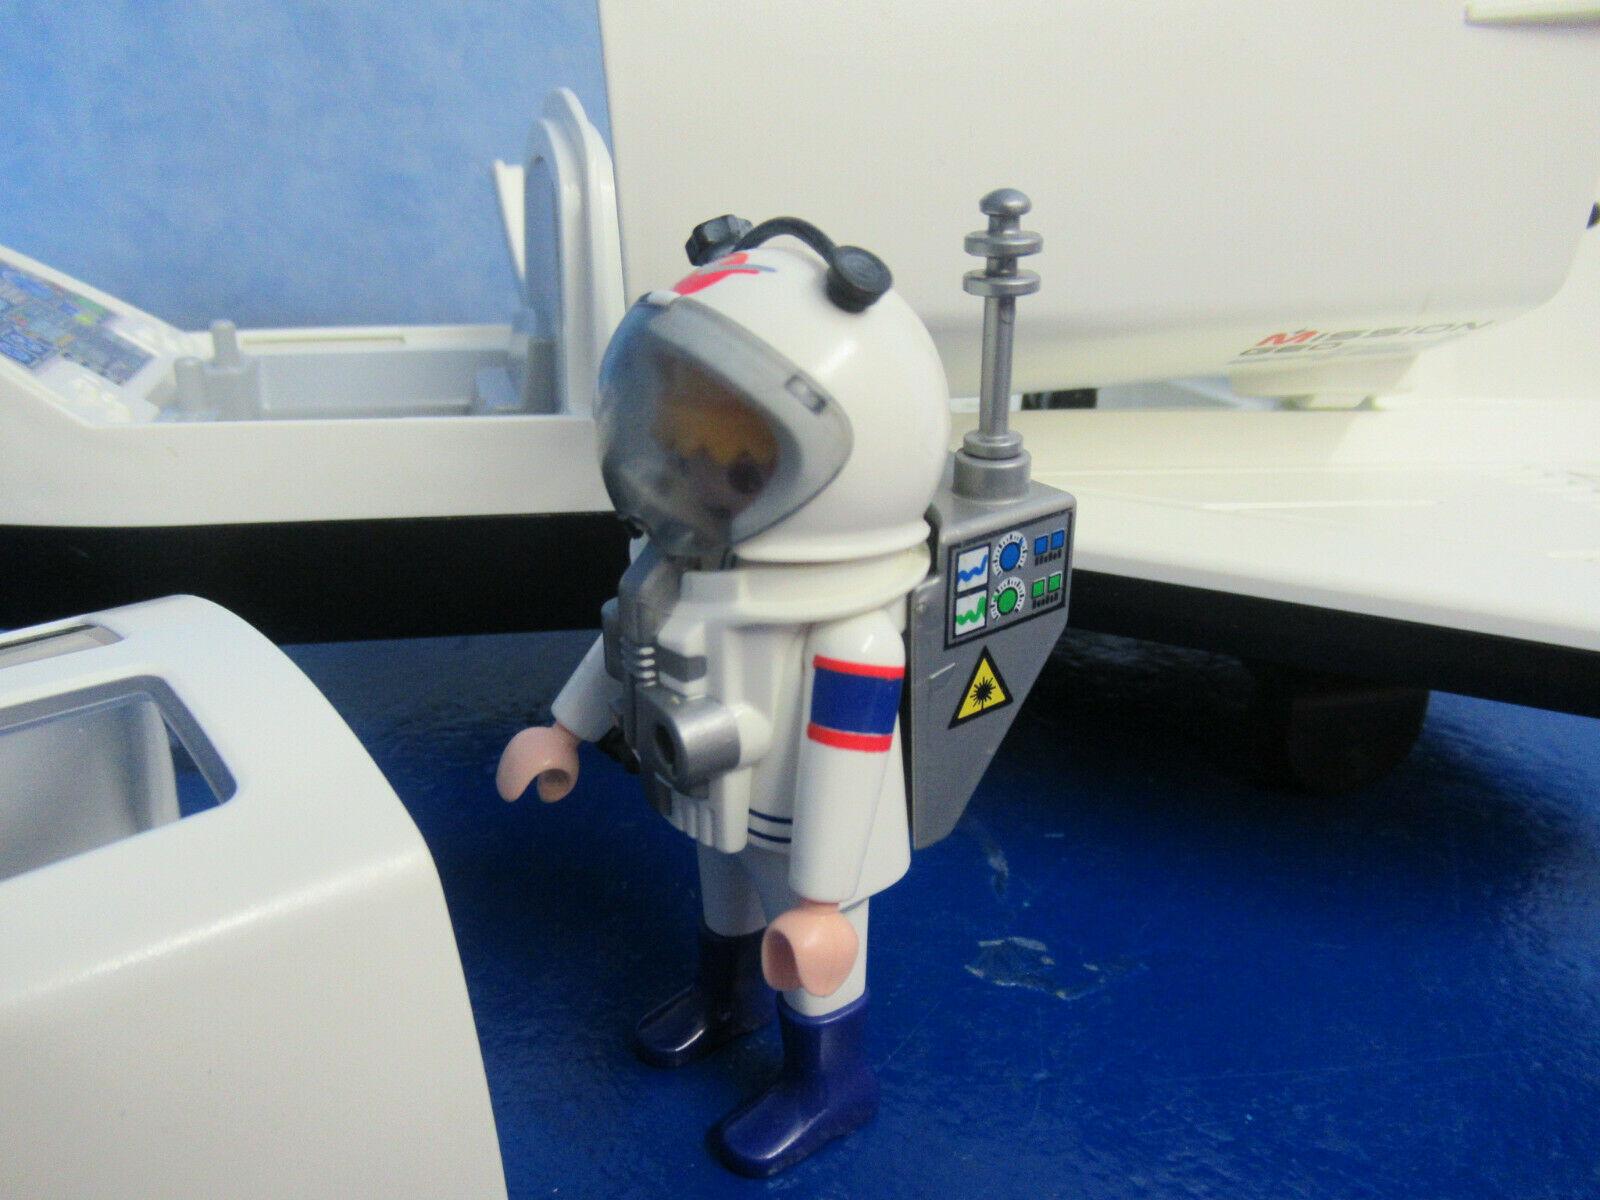 6196 Space Shuttle Figur Astronaut Zu 6195 Rakete Raumfahrt bei Playmobil Raumfahrt